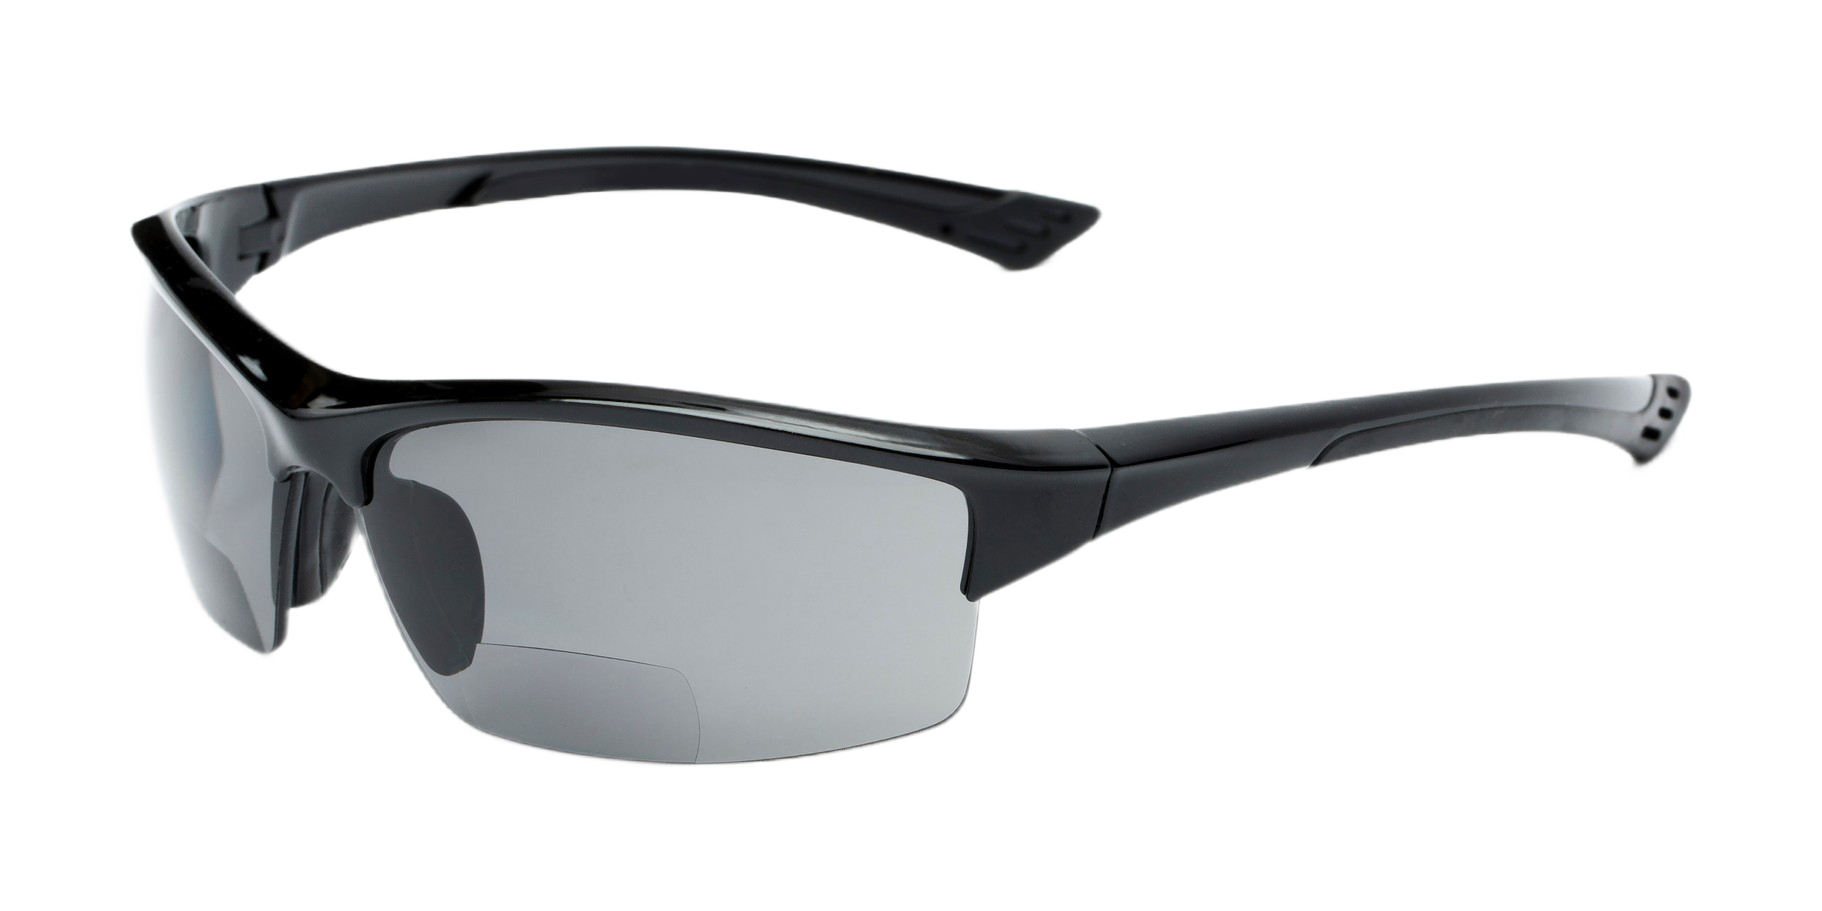 Mass-Vision-Eyewear-The-Skillful-Bifocal-Sunglasses-Black-Quarter